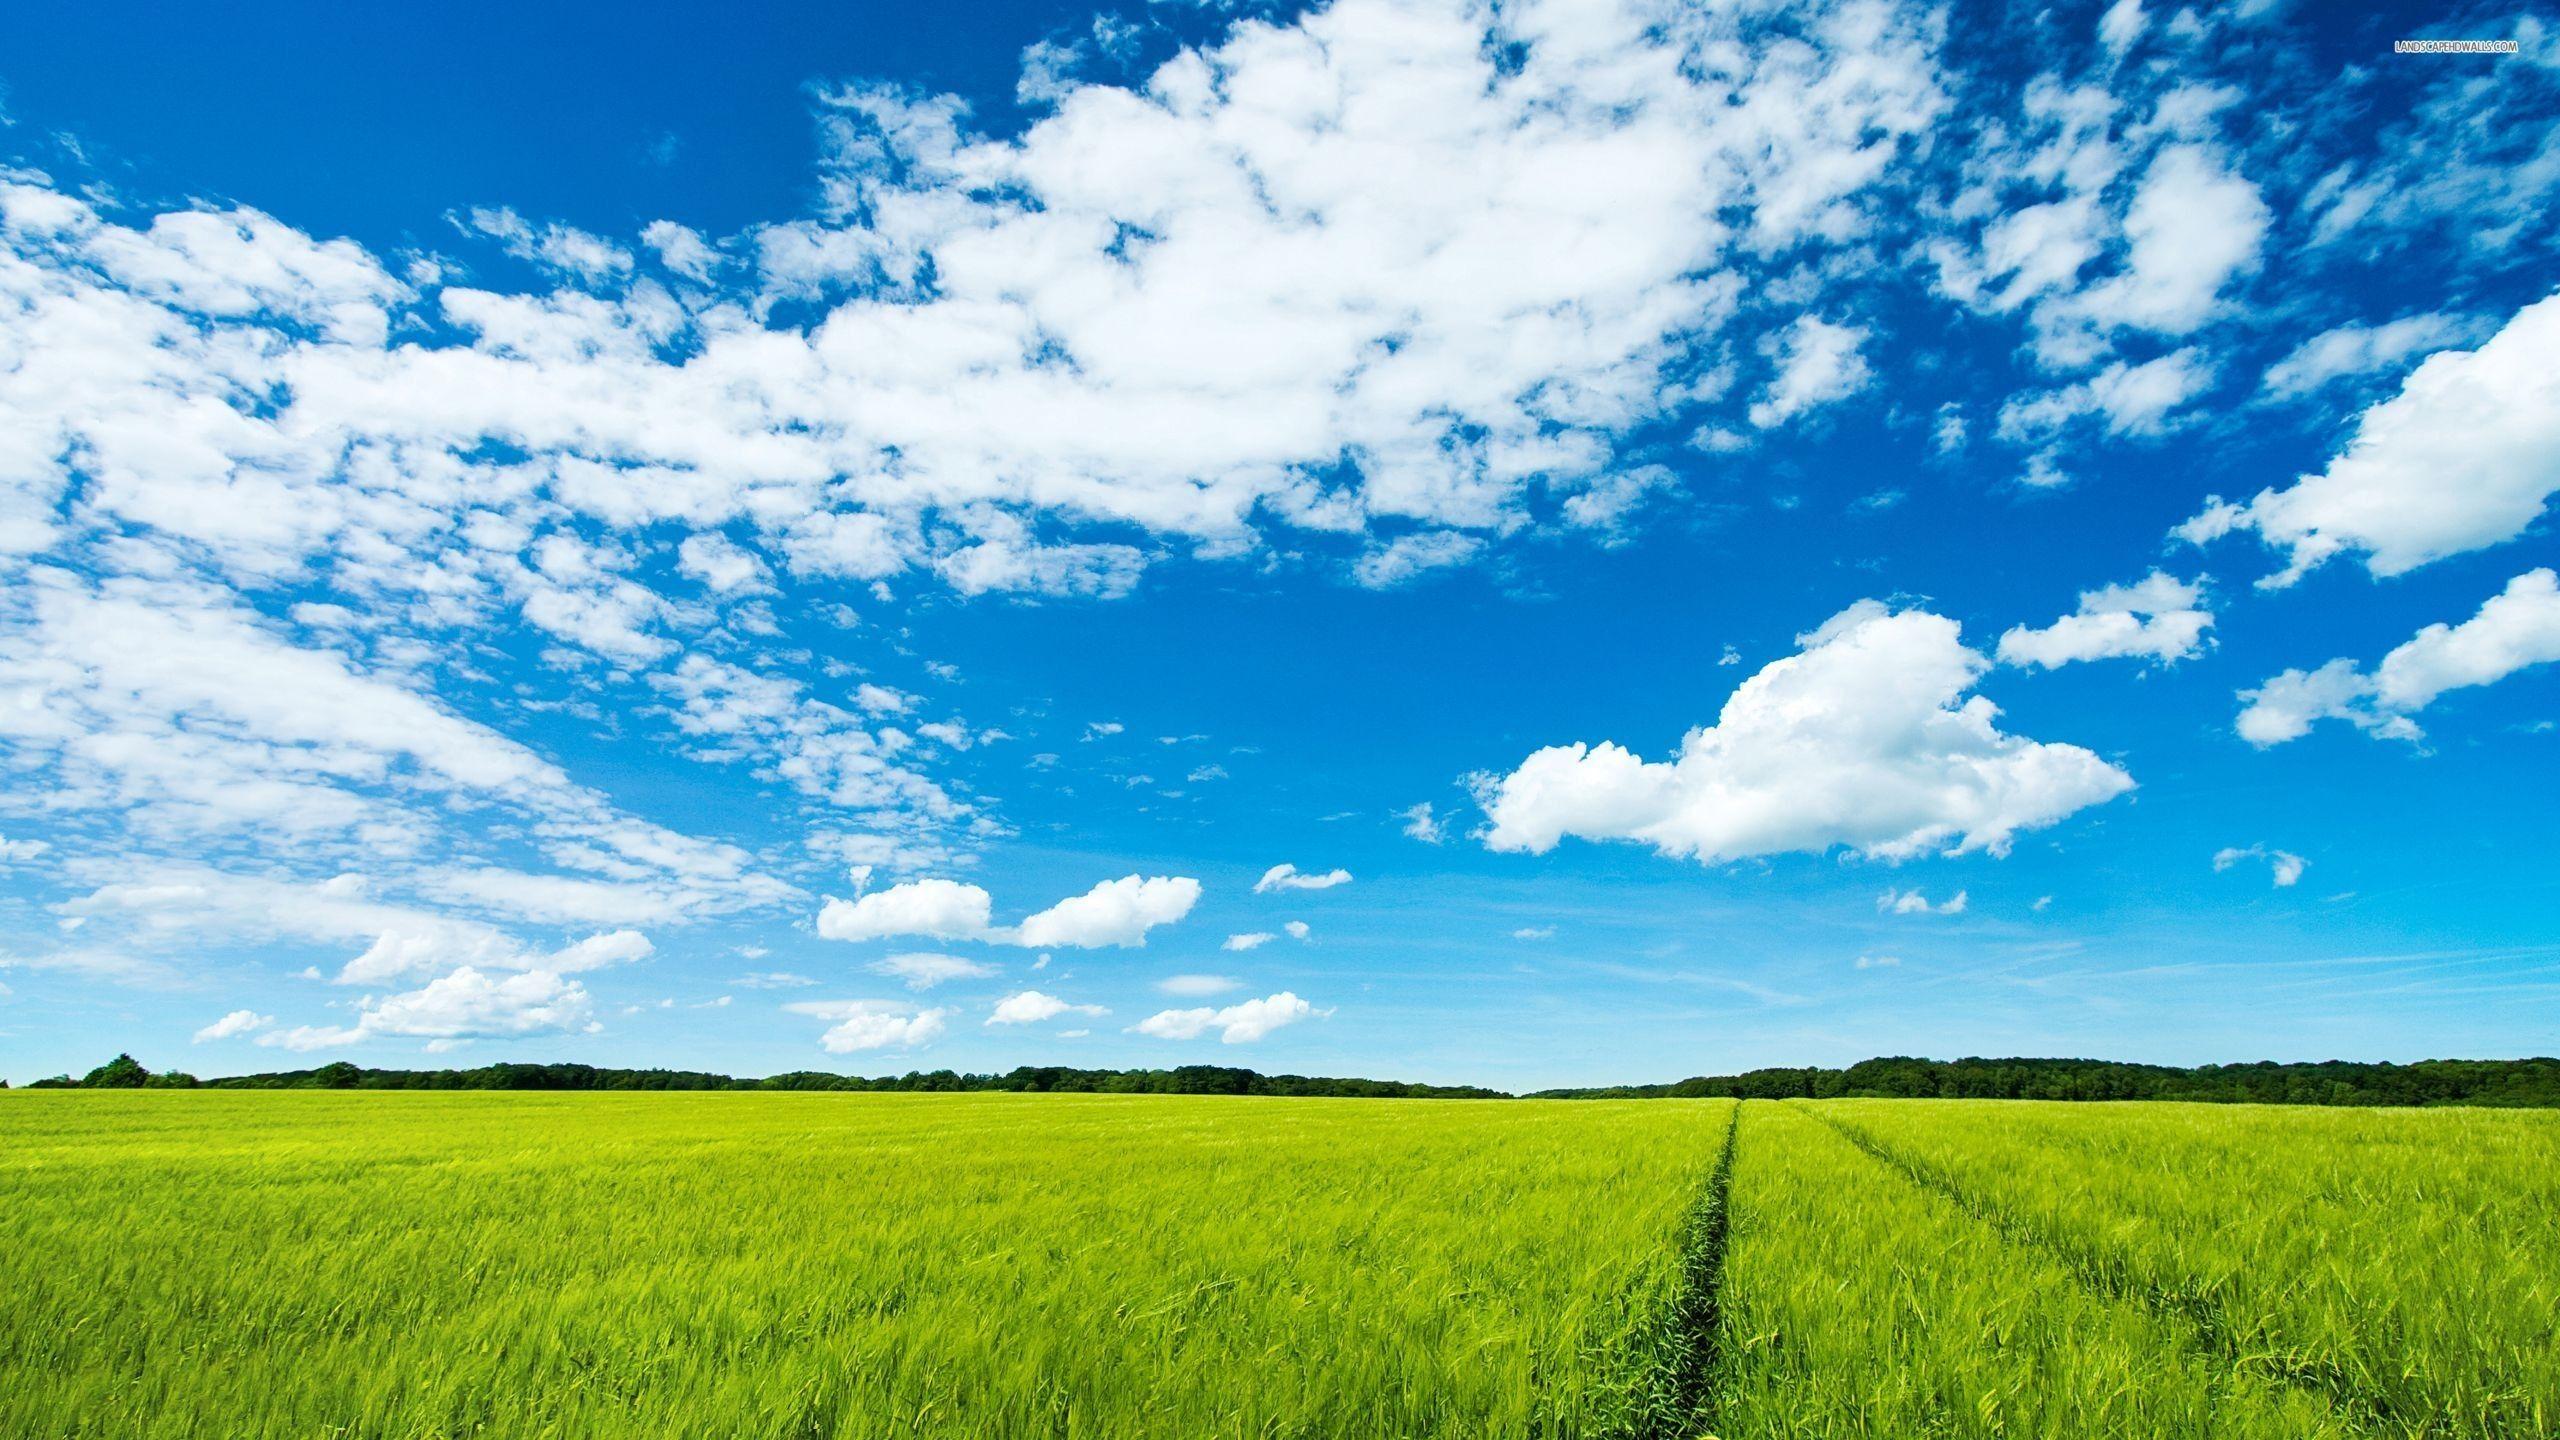 Beautiful Green Field And Blue Sky Hd Wallpaper Summer Landscape